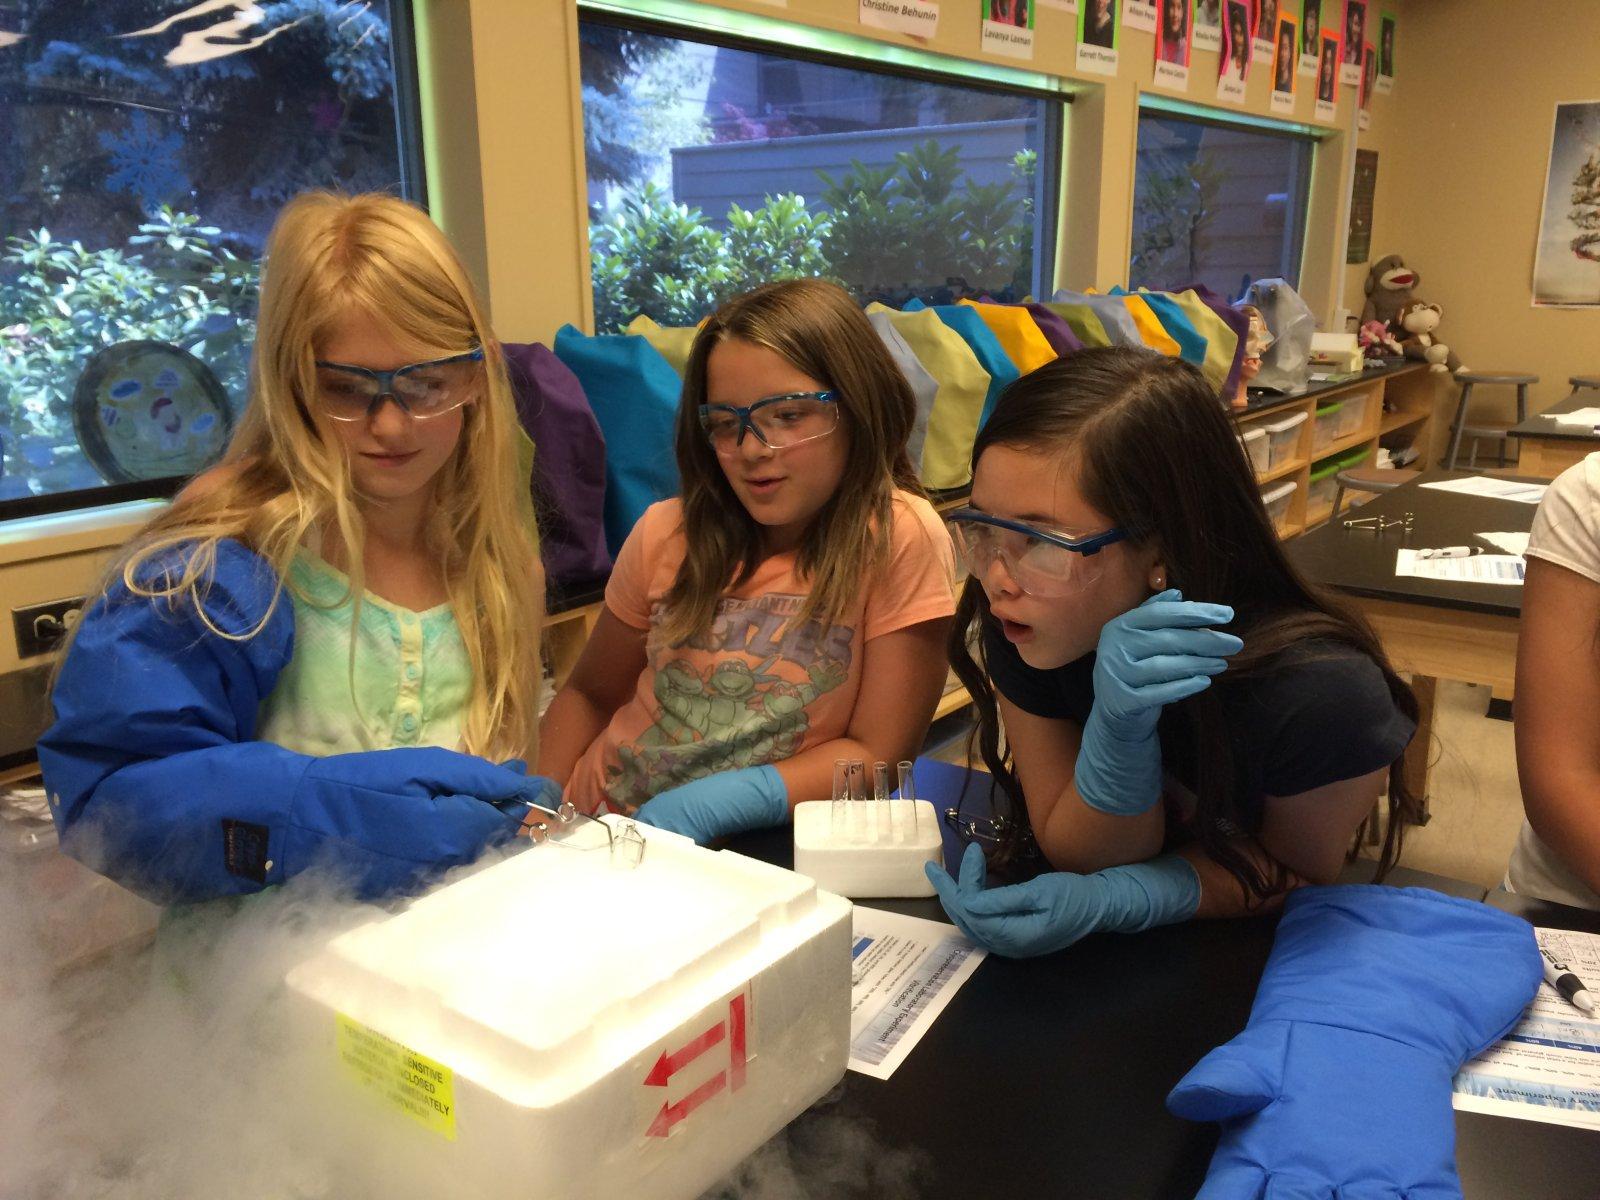 awsem camp  science  u0026 engineering for girls